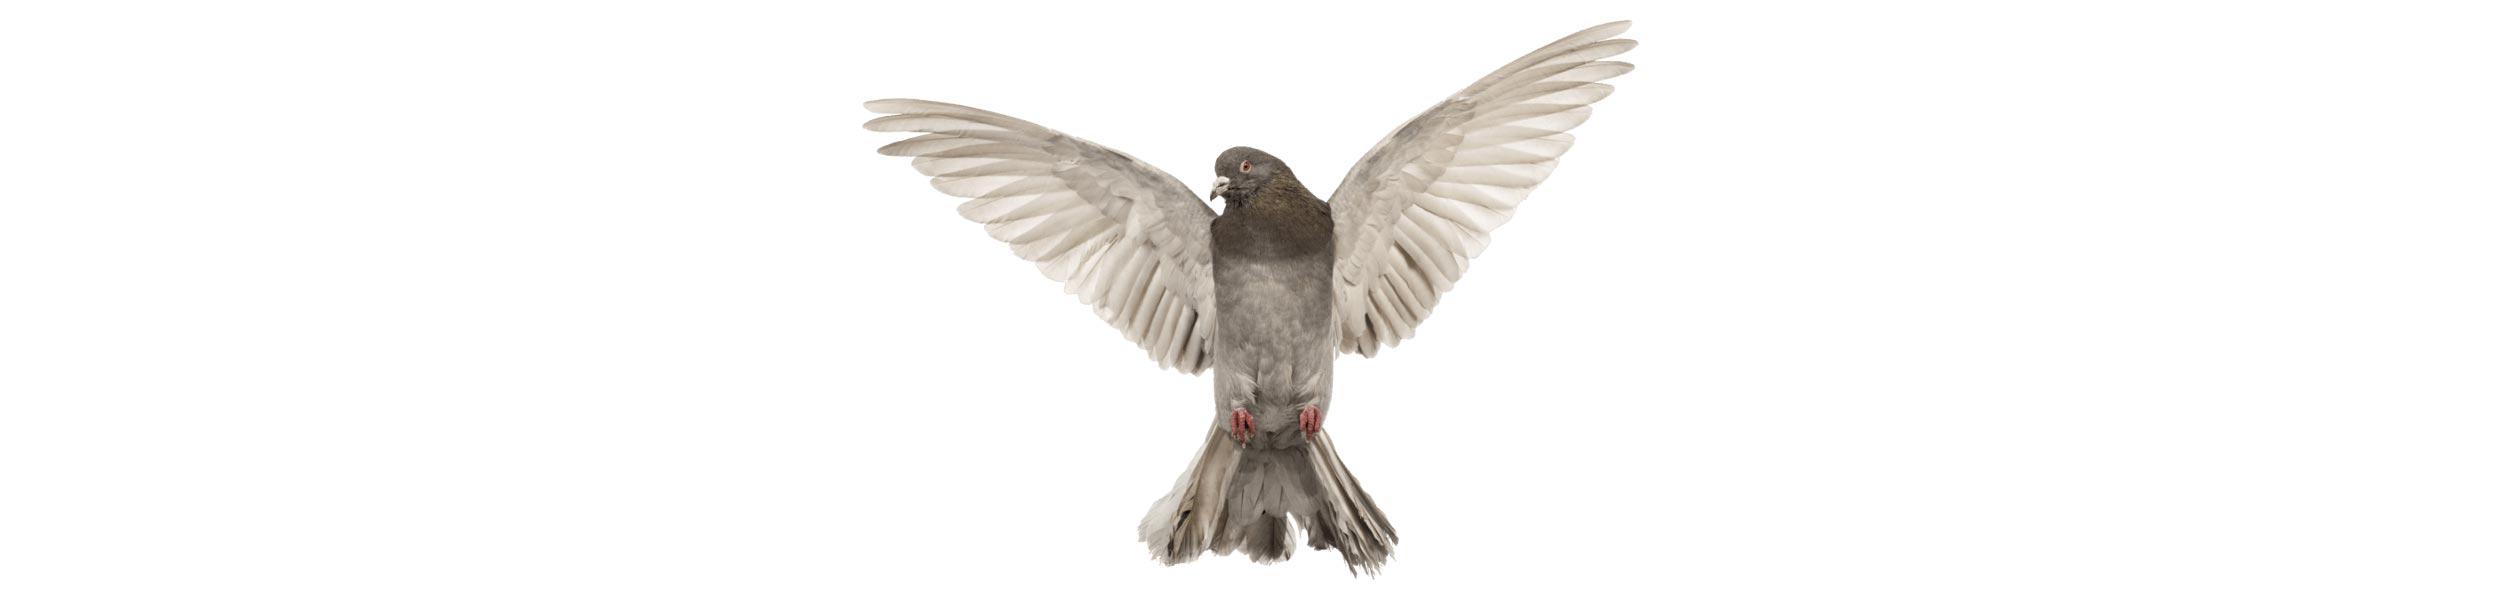 ACE Exterminating-Pest-Control-bird-photo